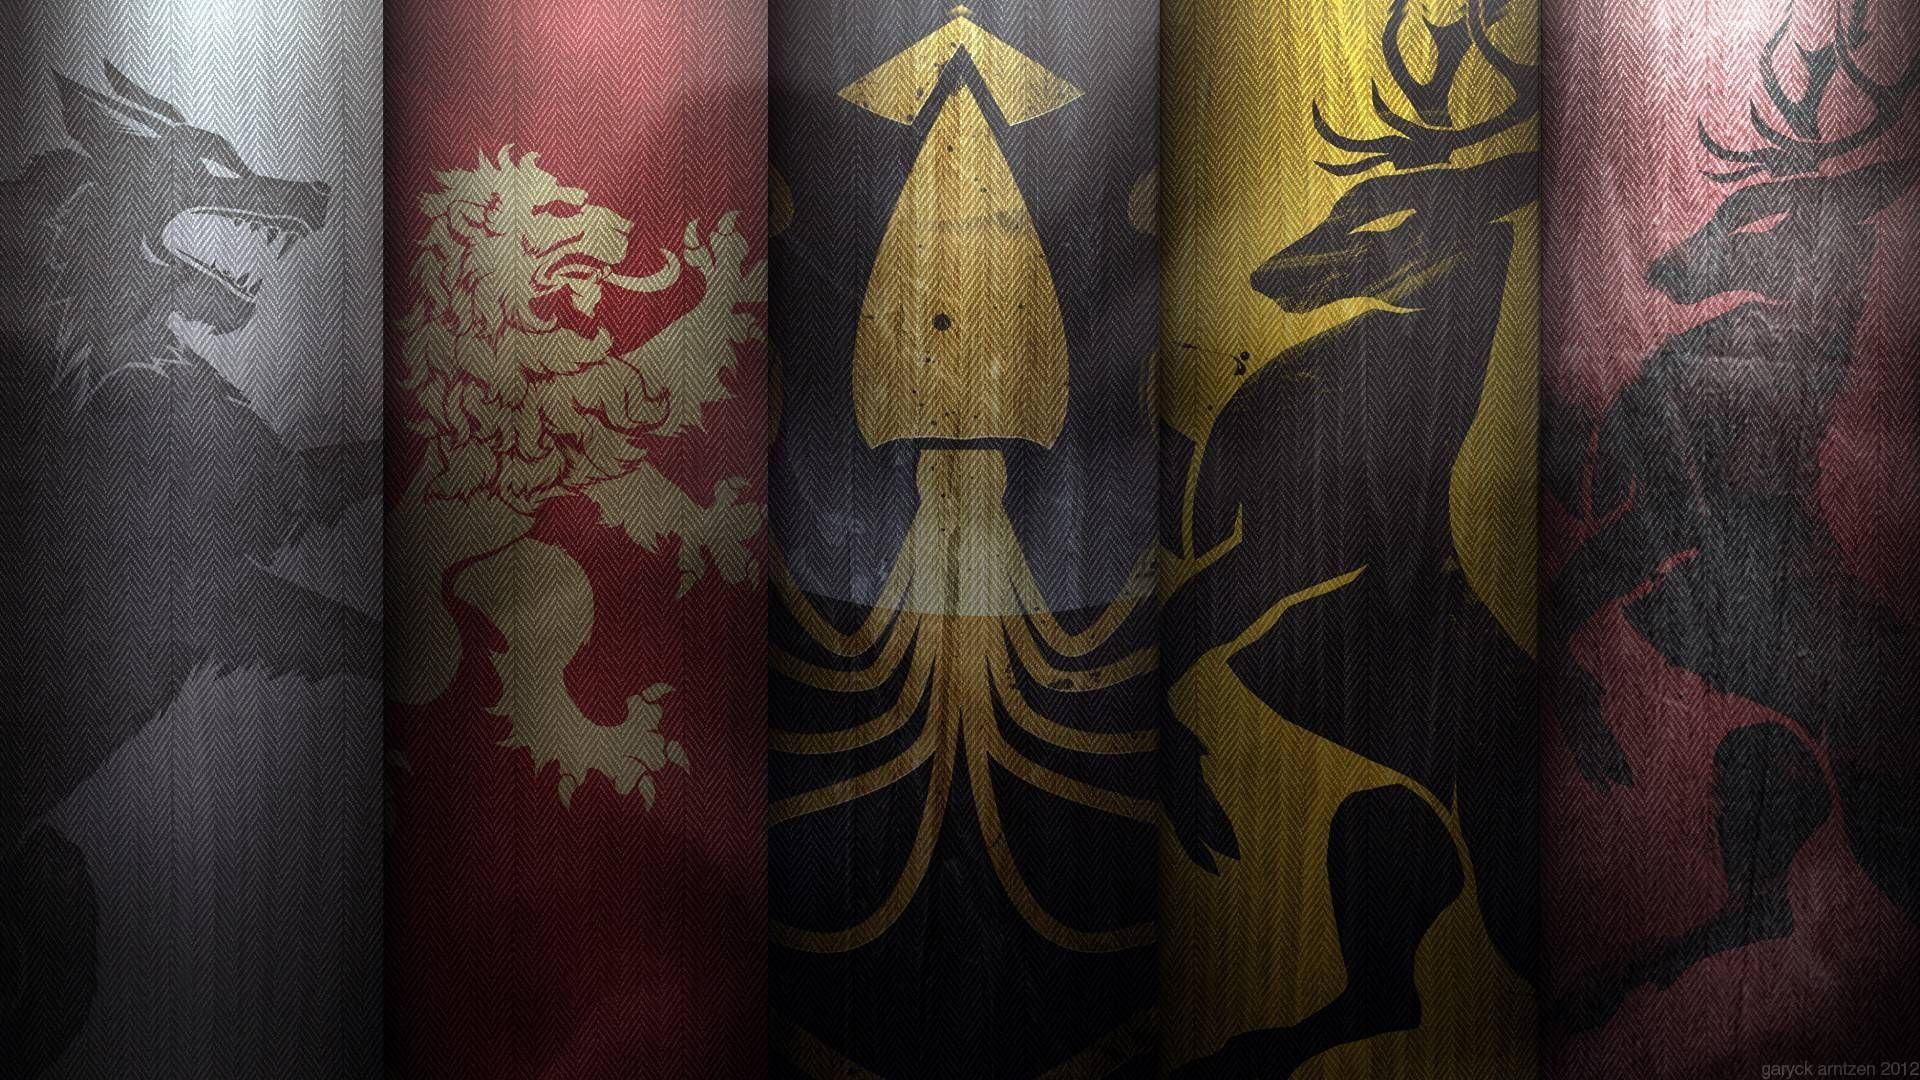 Game Of Thrones Wallpapers [1920X1080] My Wallpaper Collection Zelda Avatar